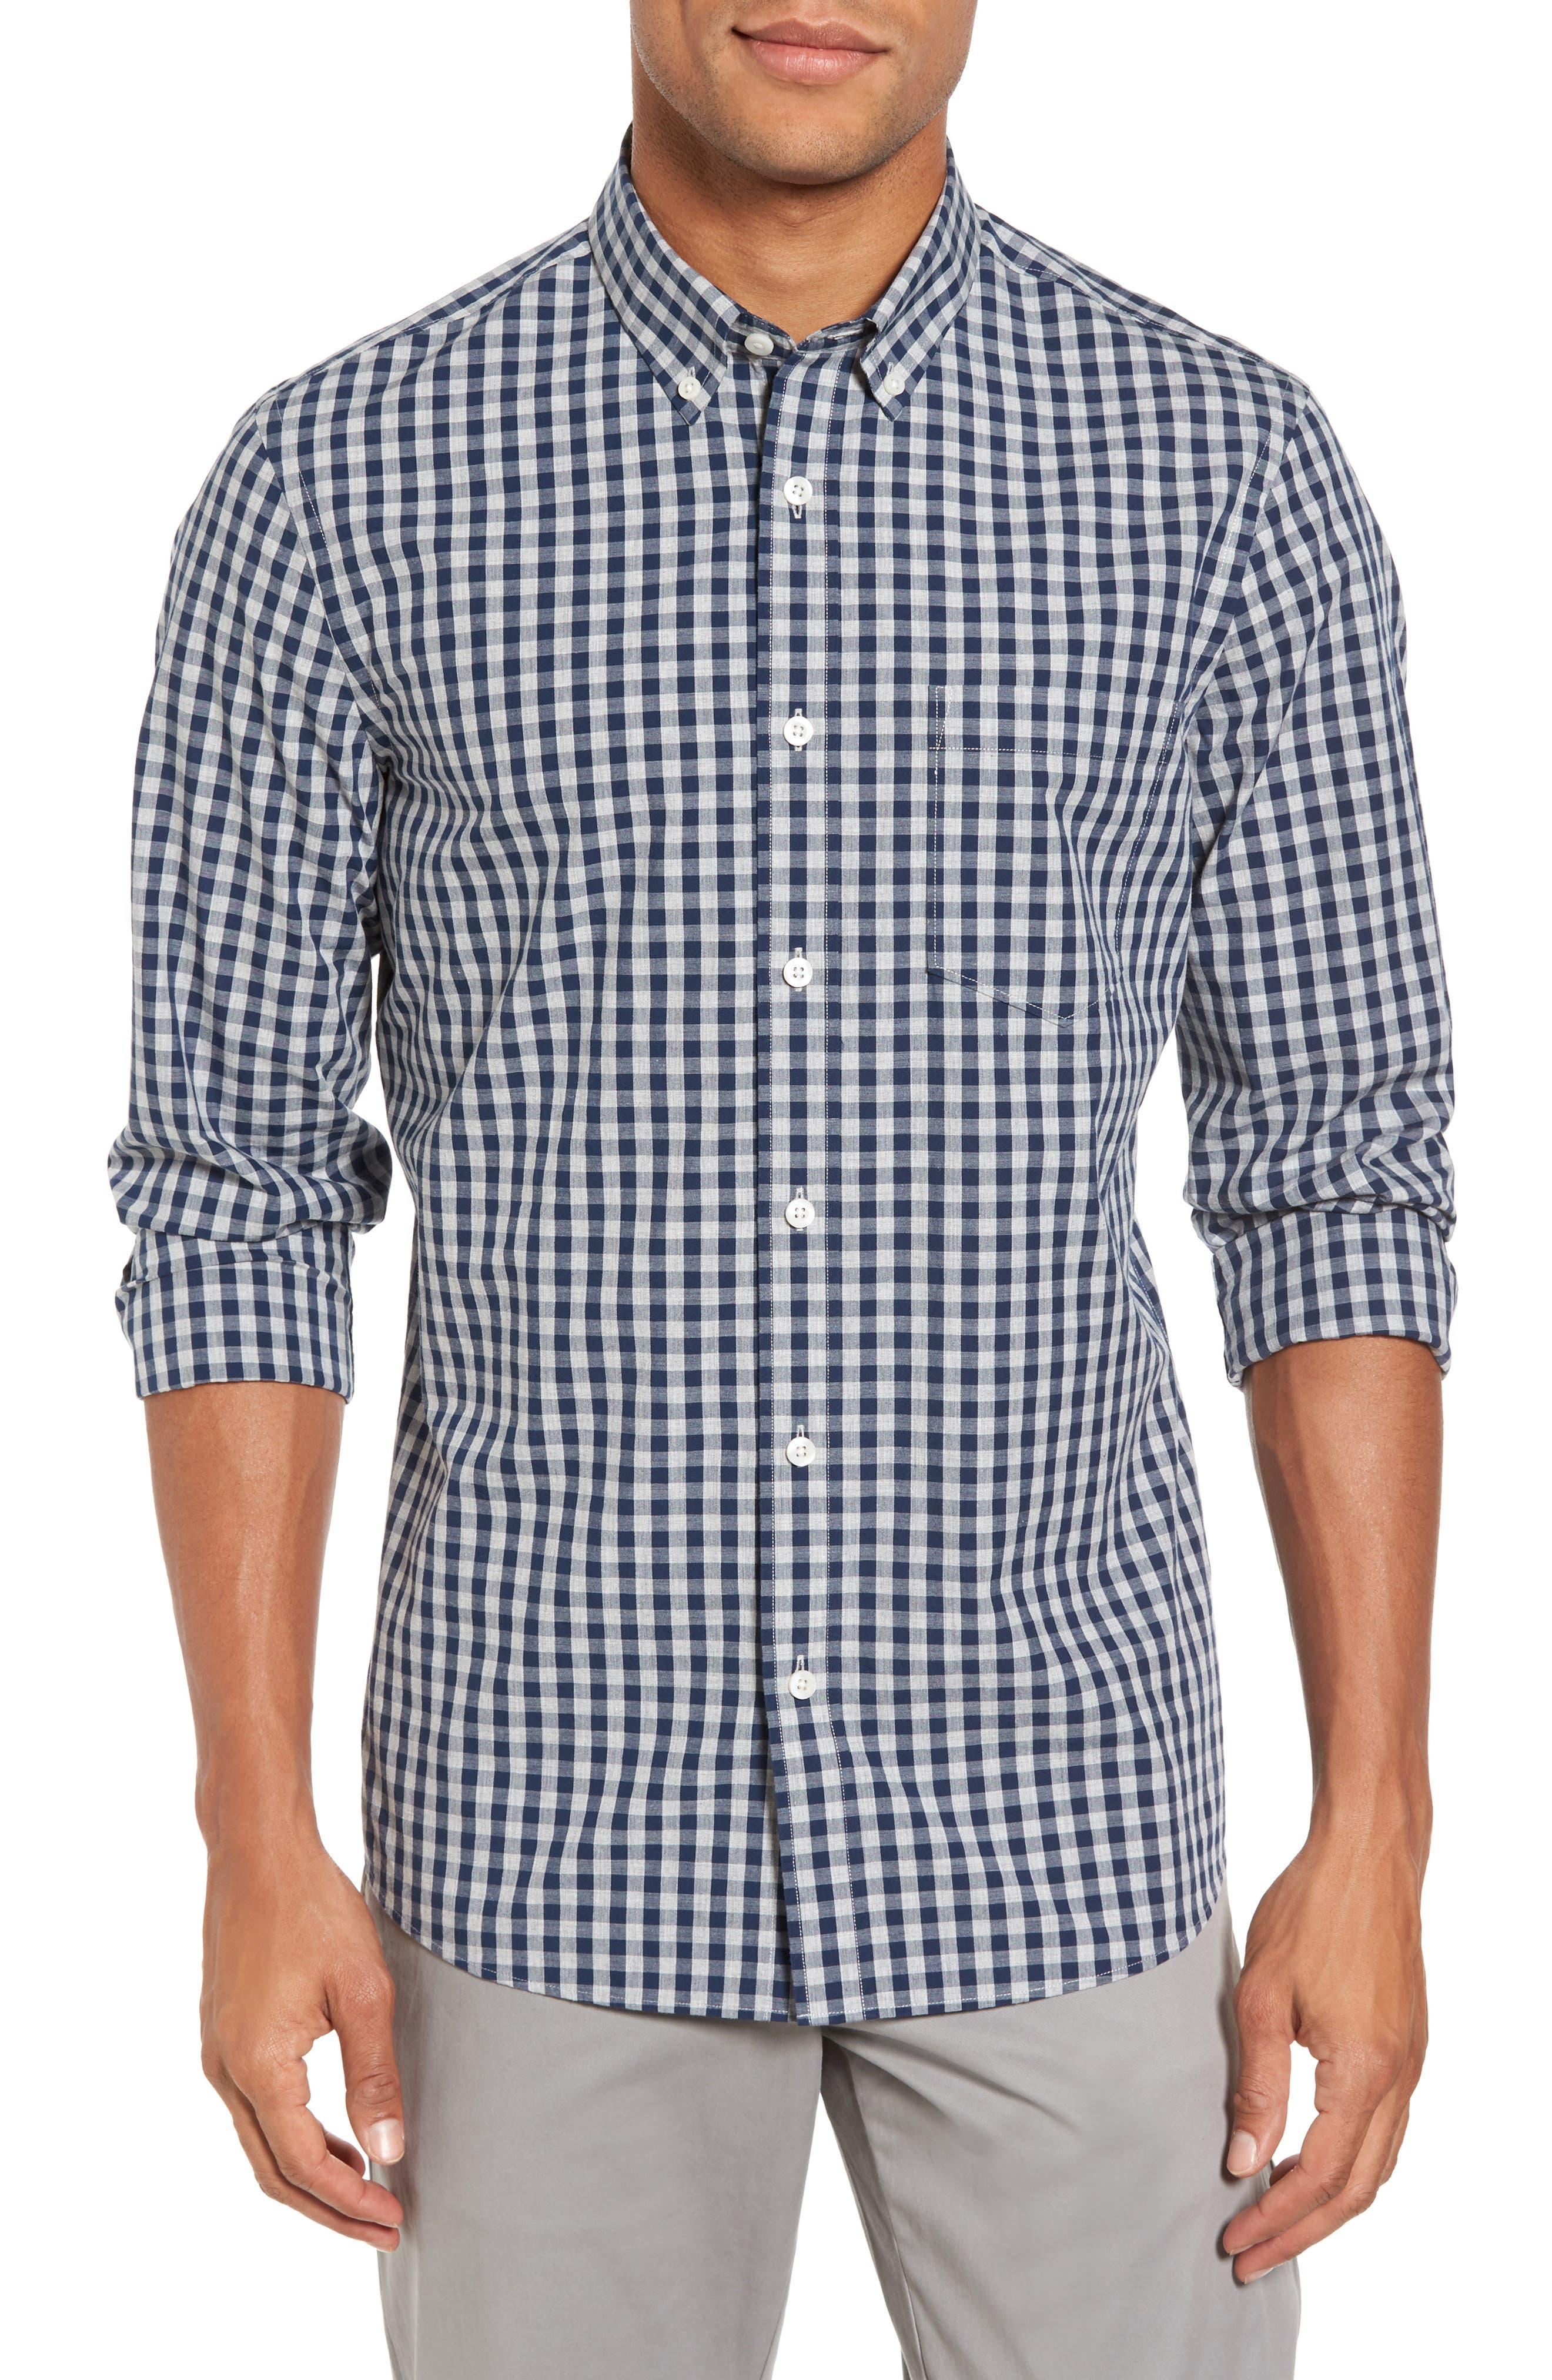 Spade Trim Fit Gingham Check Sport Shirt,                         Main,                         color, Grey Shade Navy Gingham